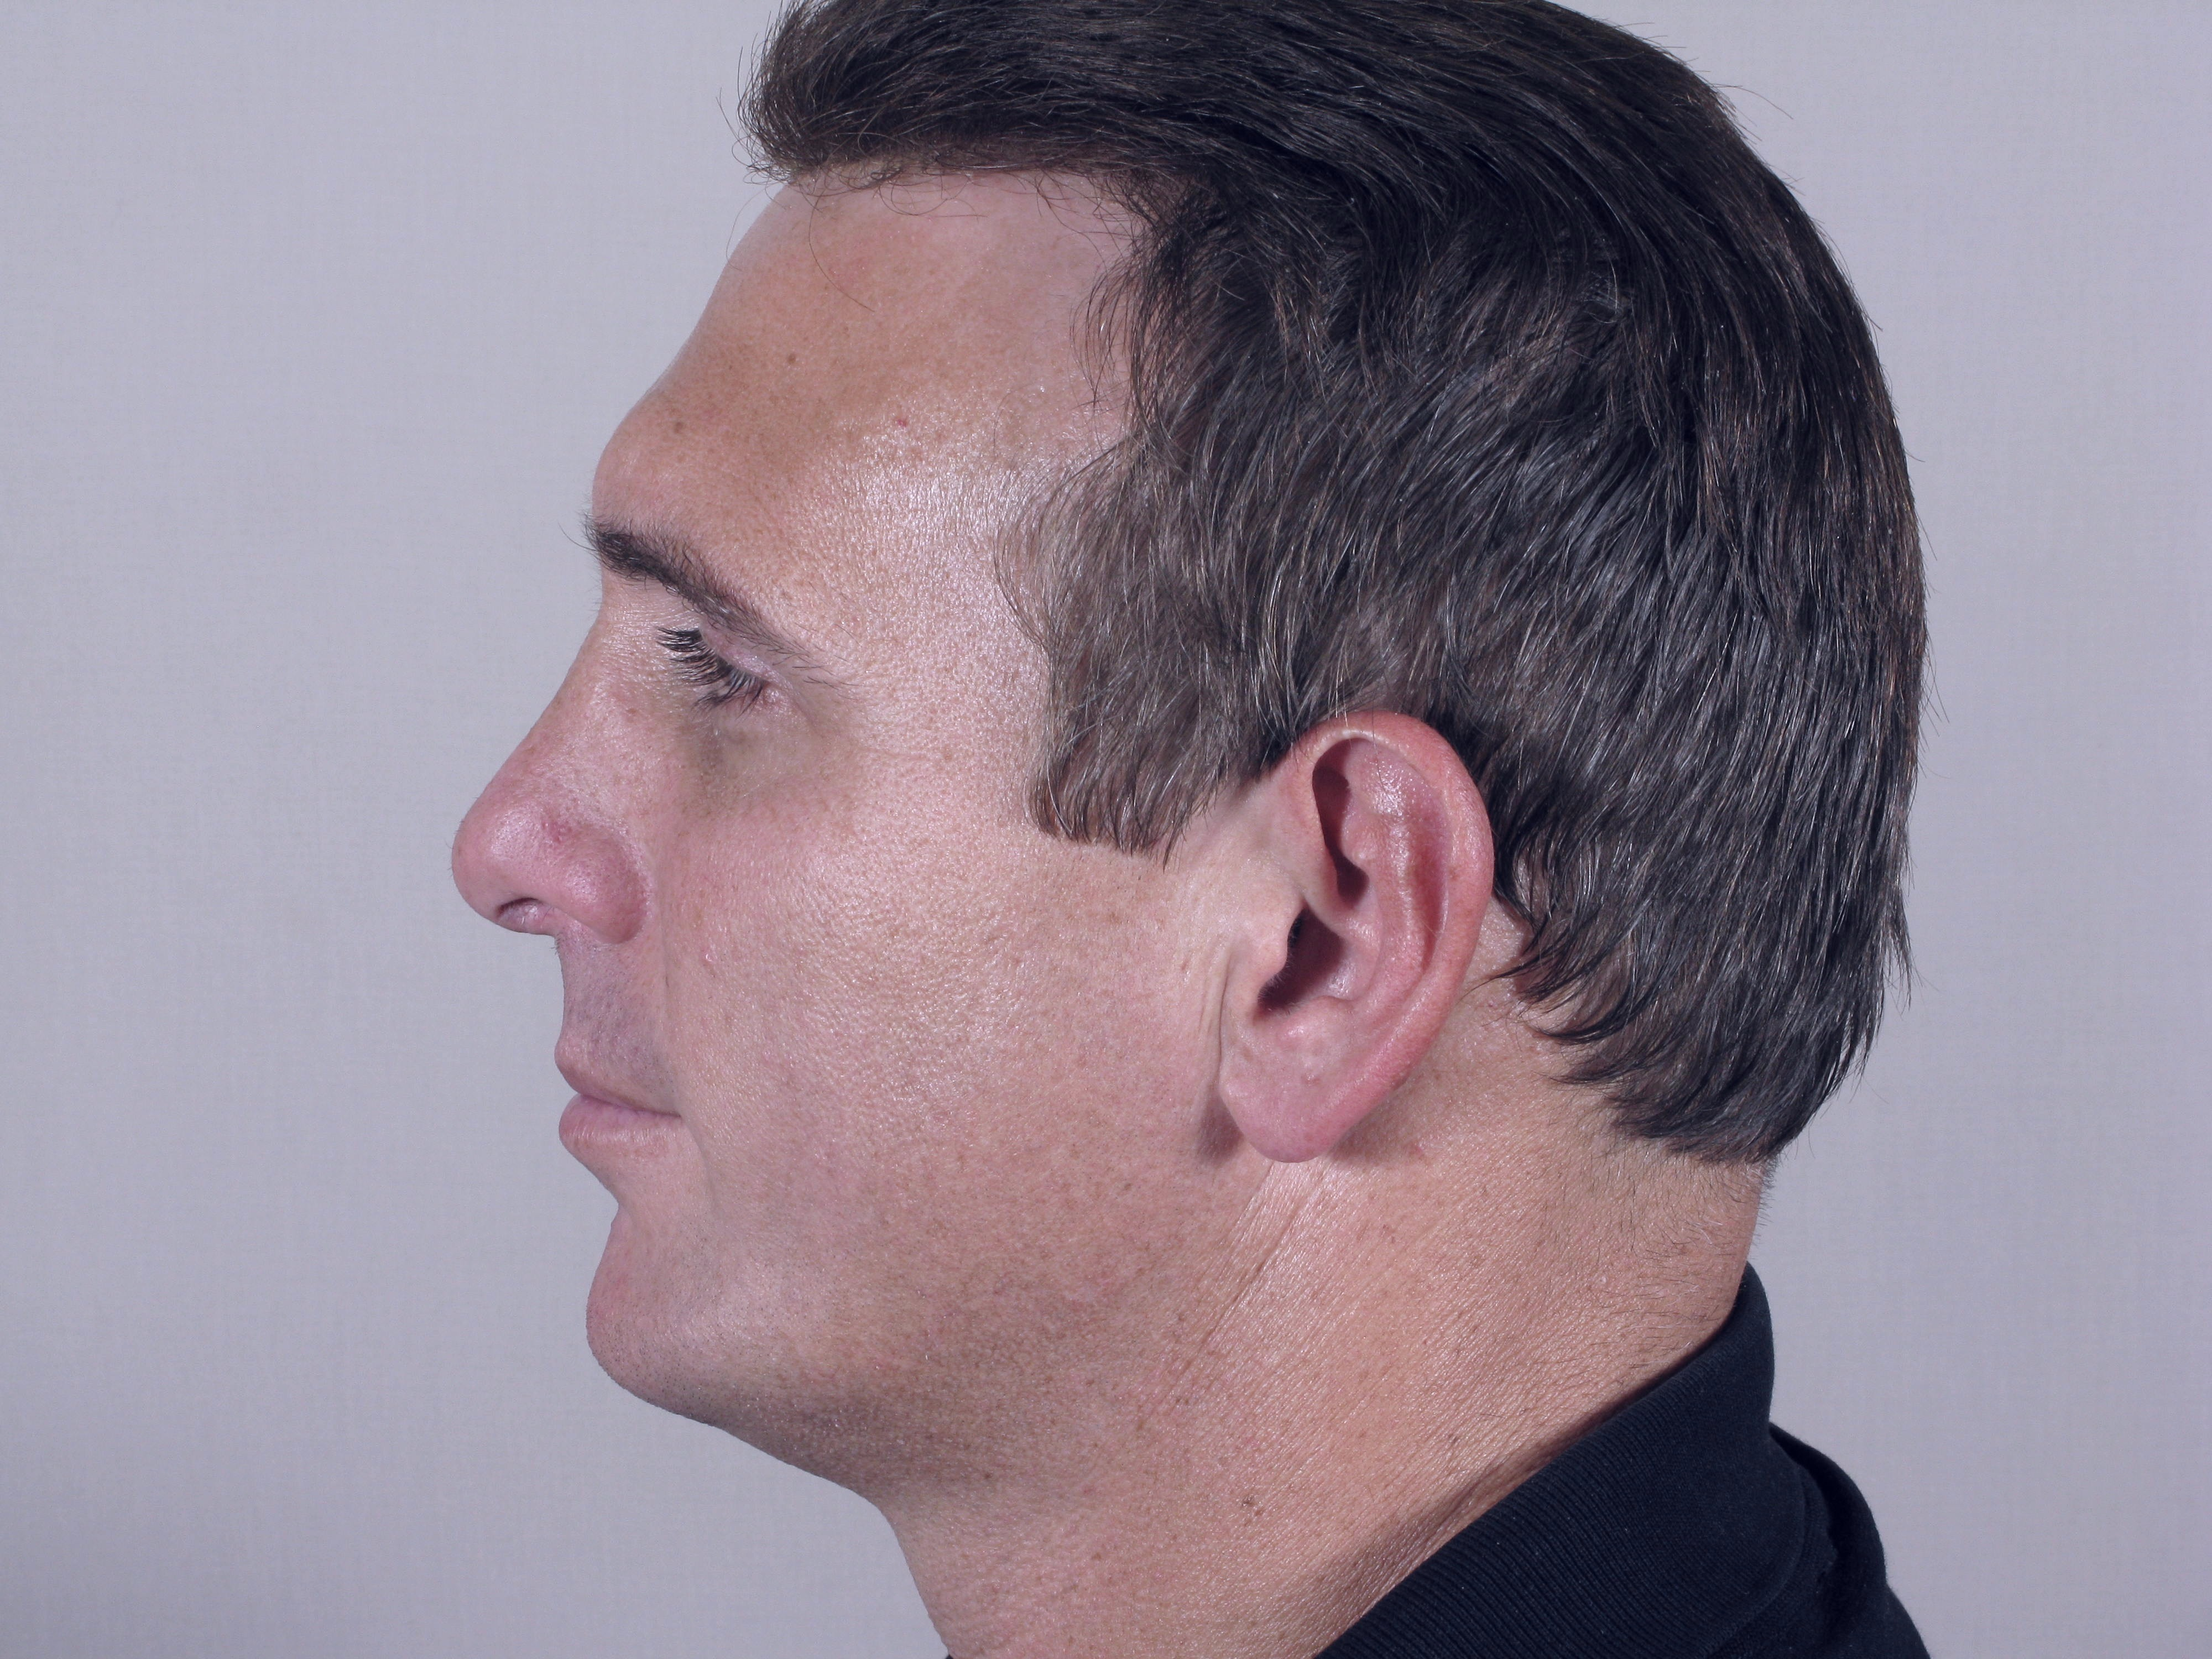 форма мужского лба надбровные дуги фото накануне